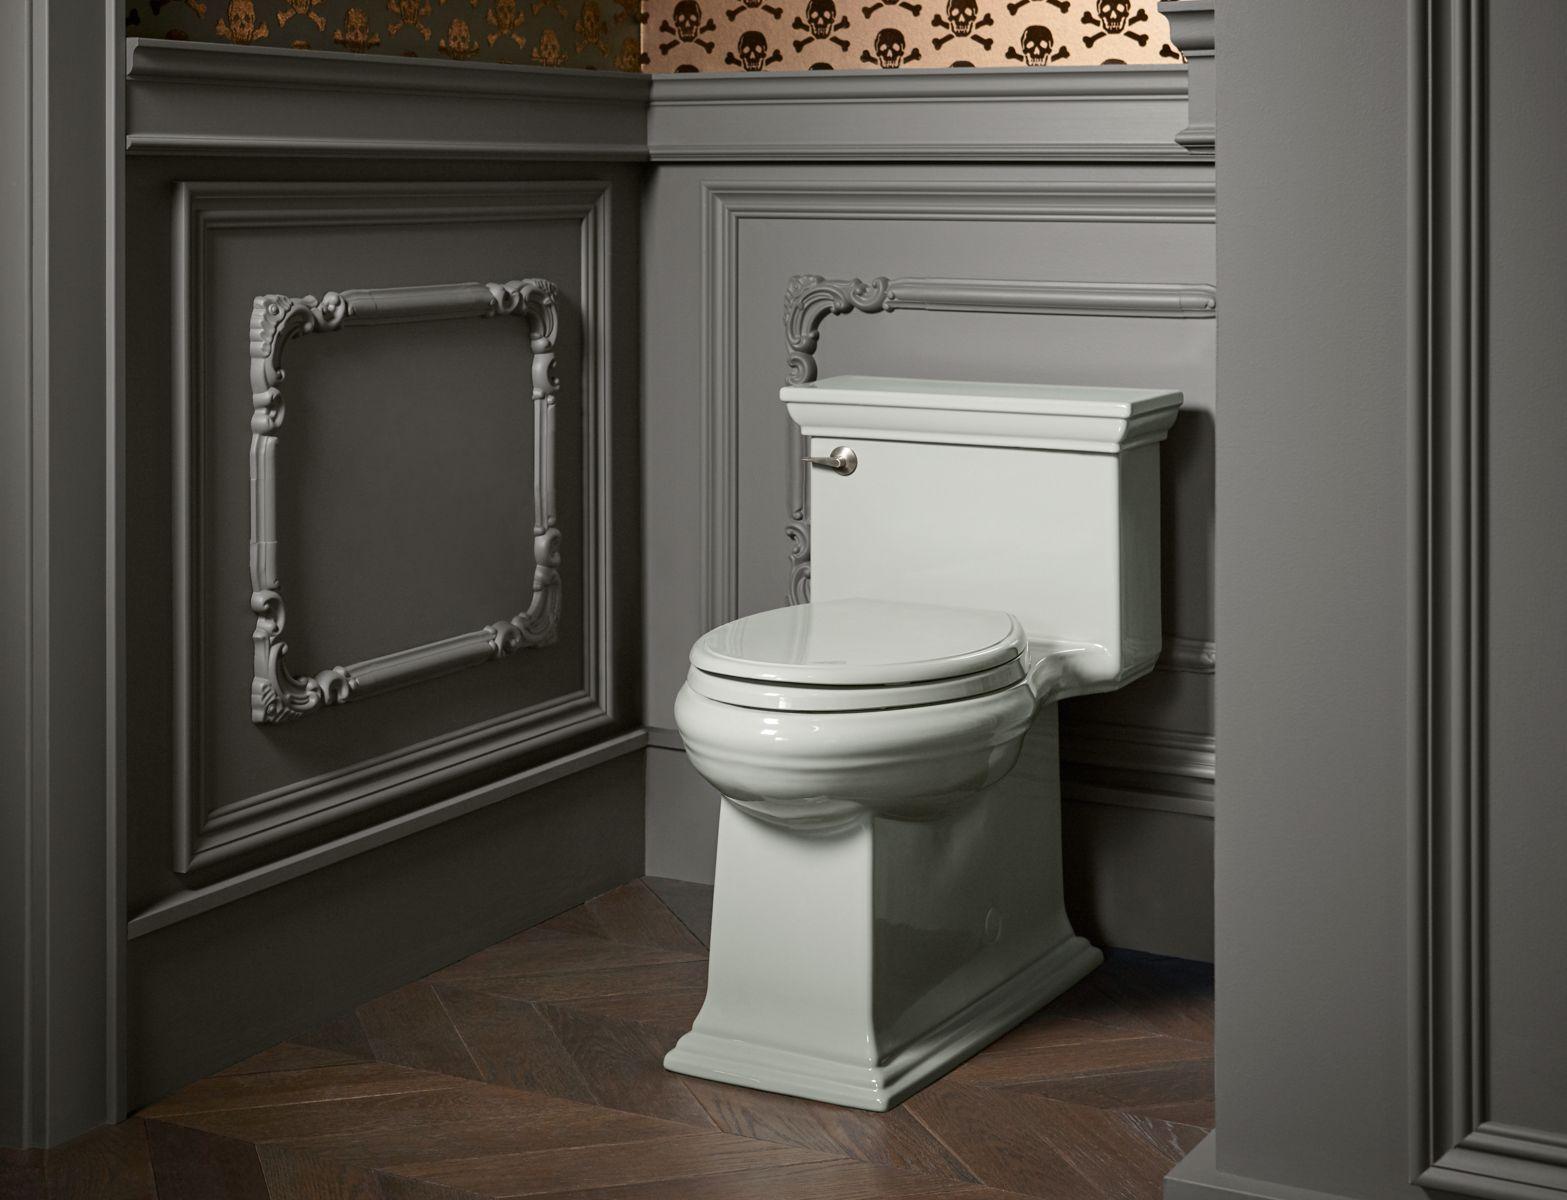 singleflush toilets